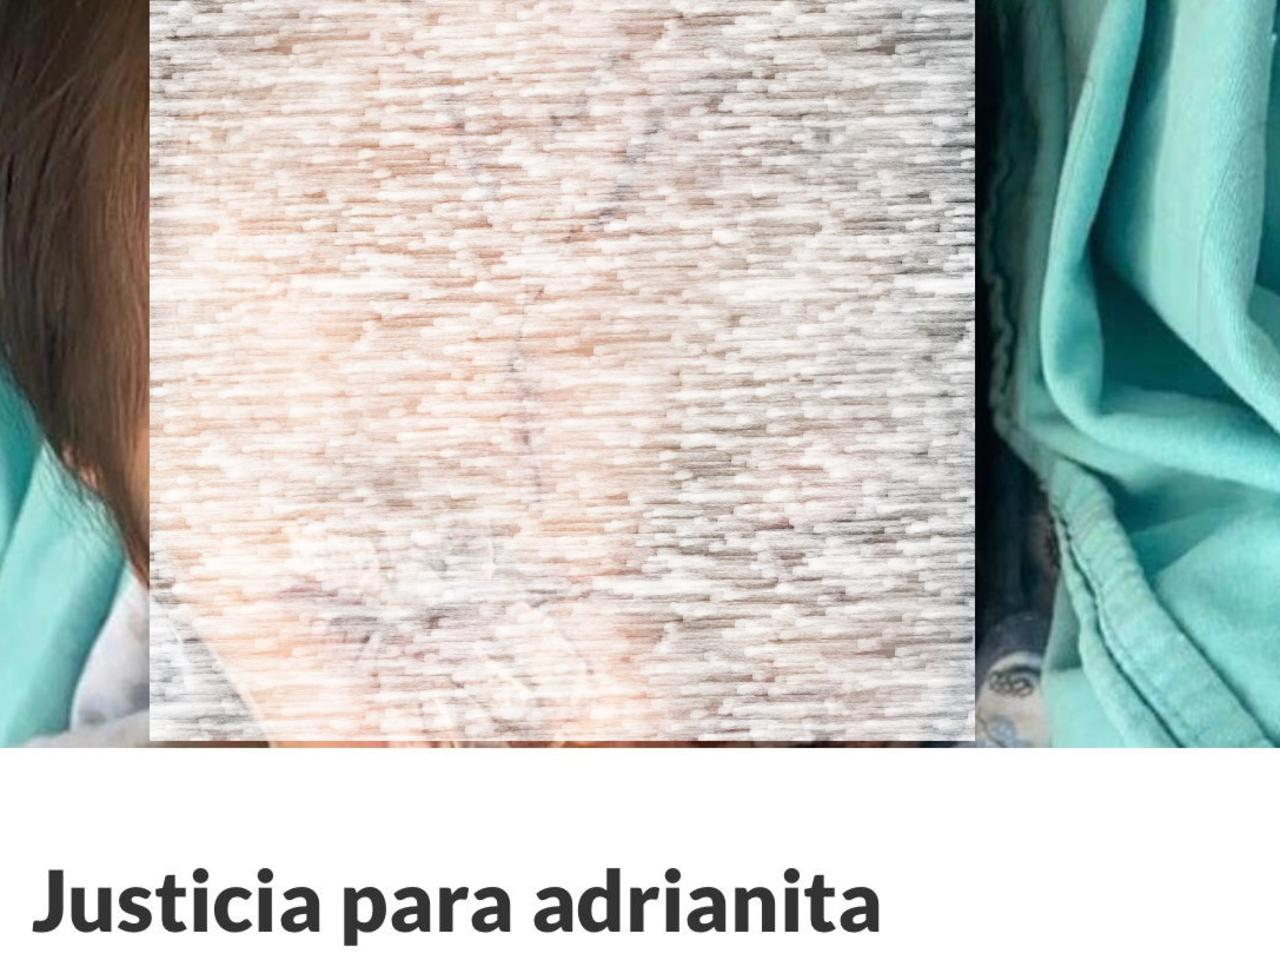 Recaudan fondos para Adriana, niña agredida por su padre